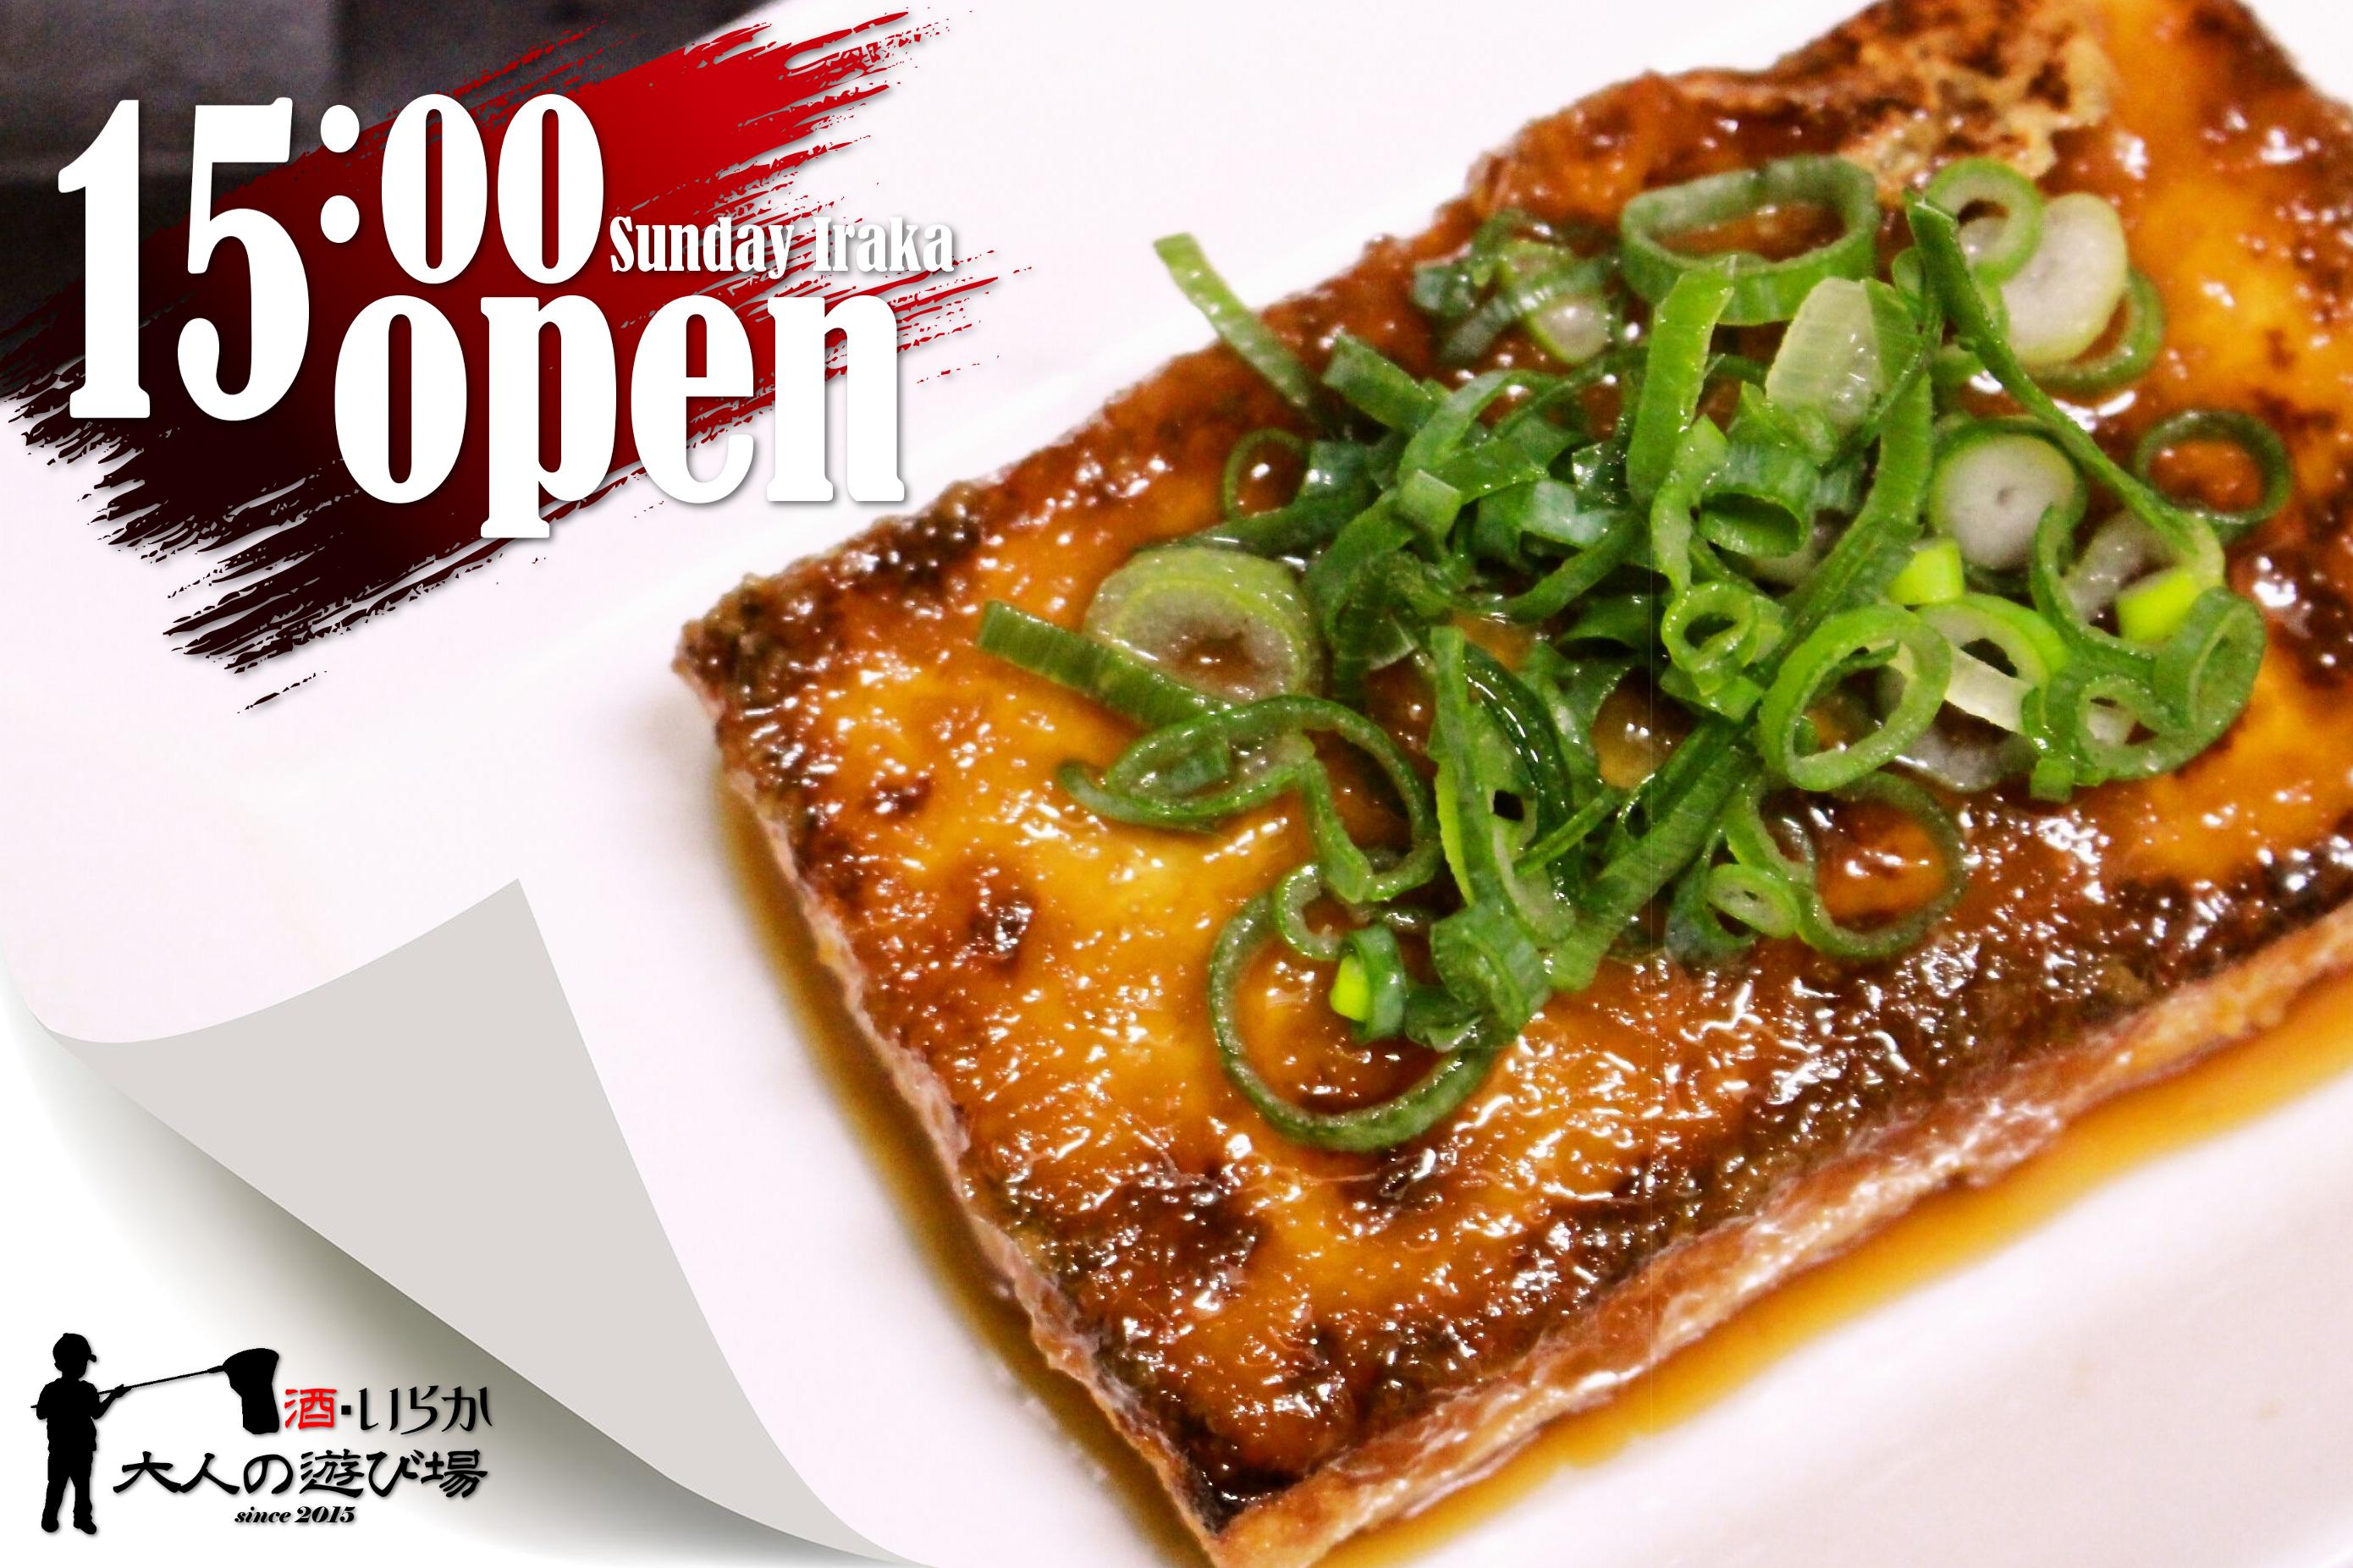 foodpic83819343.jpg